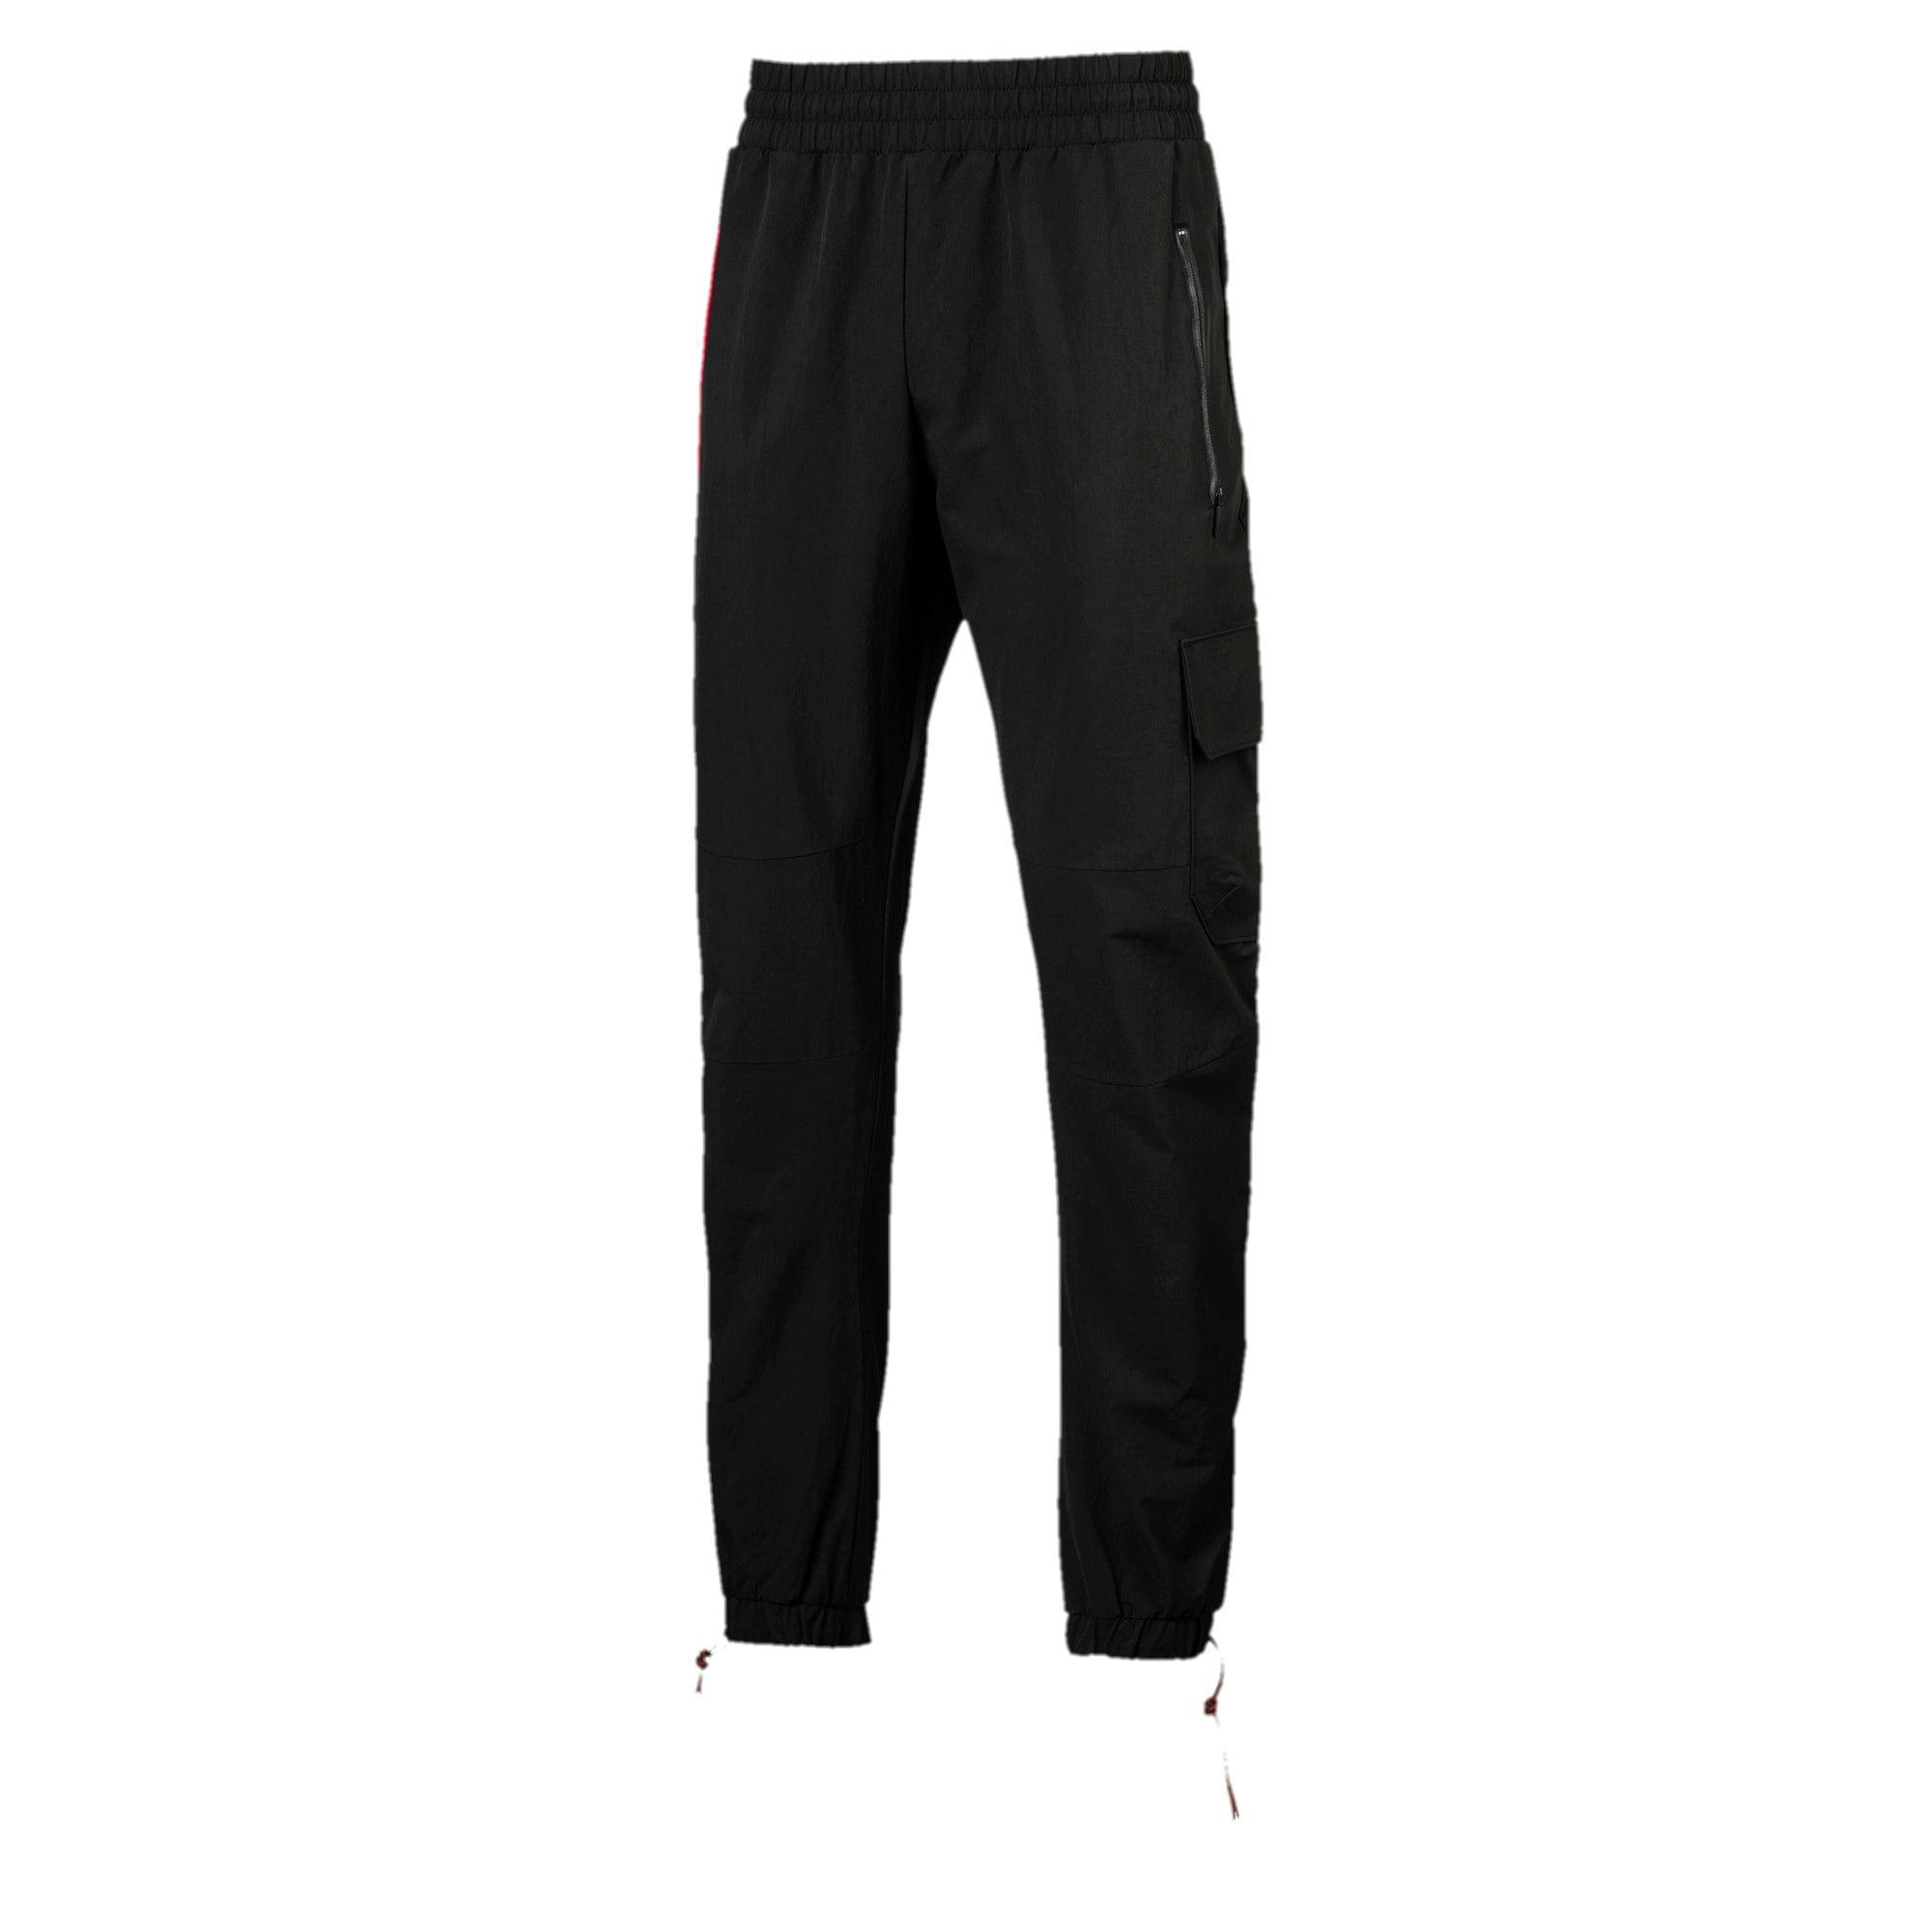 Thumbnail 1 of Ferrari SFXX Lifestyle Men's Woven Pants, Puma Black, medium-IND